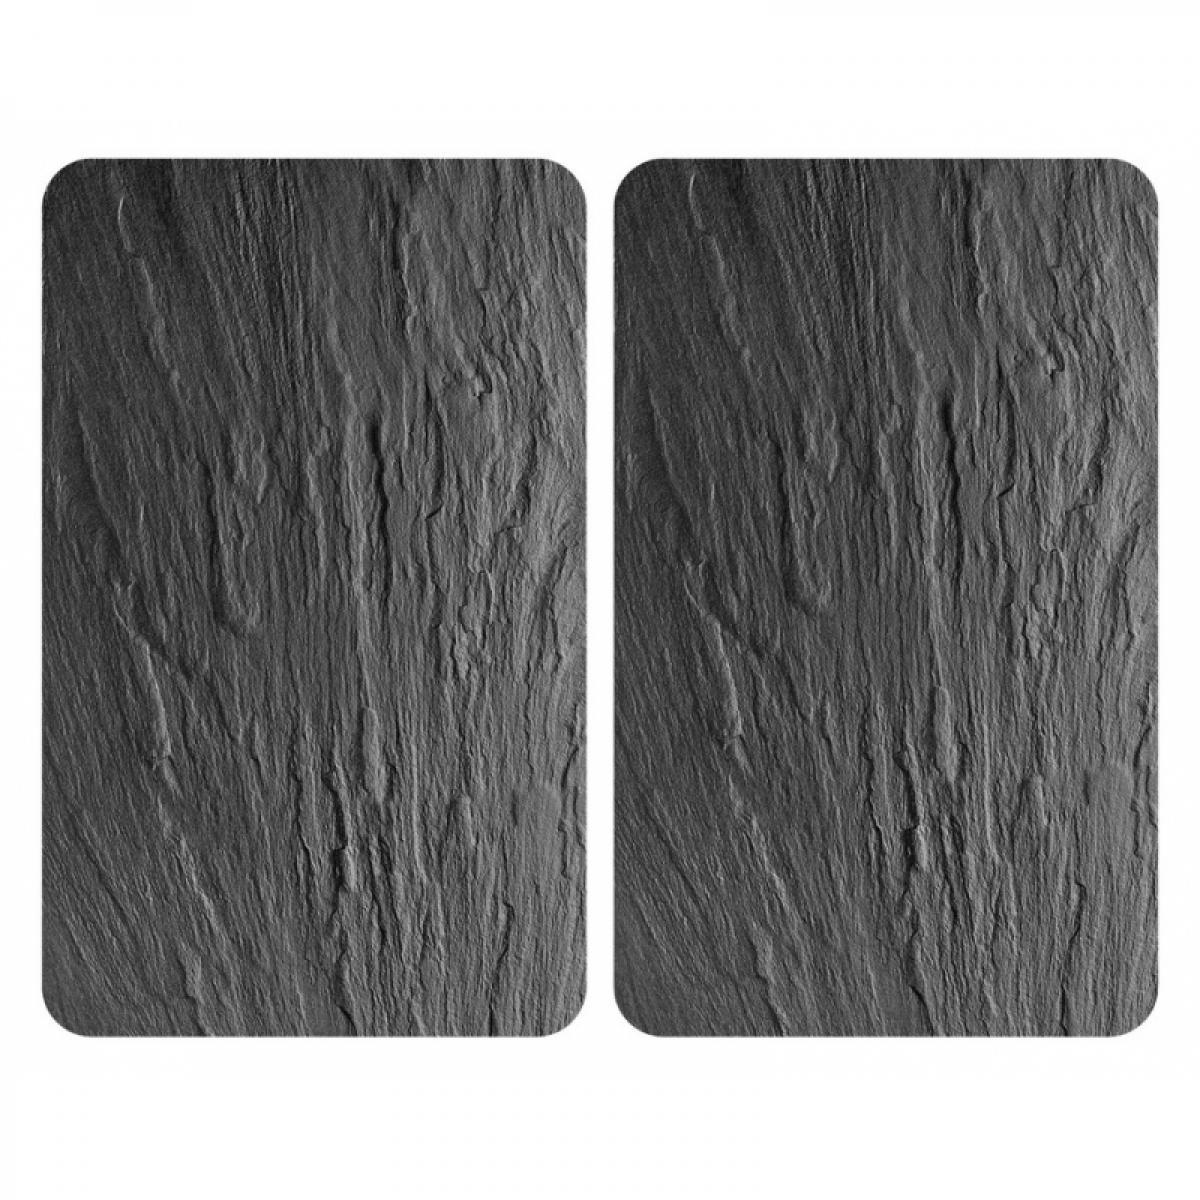 Wenko Protection plaque de cuisson WENKO Plaque de protection ardoise